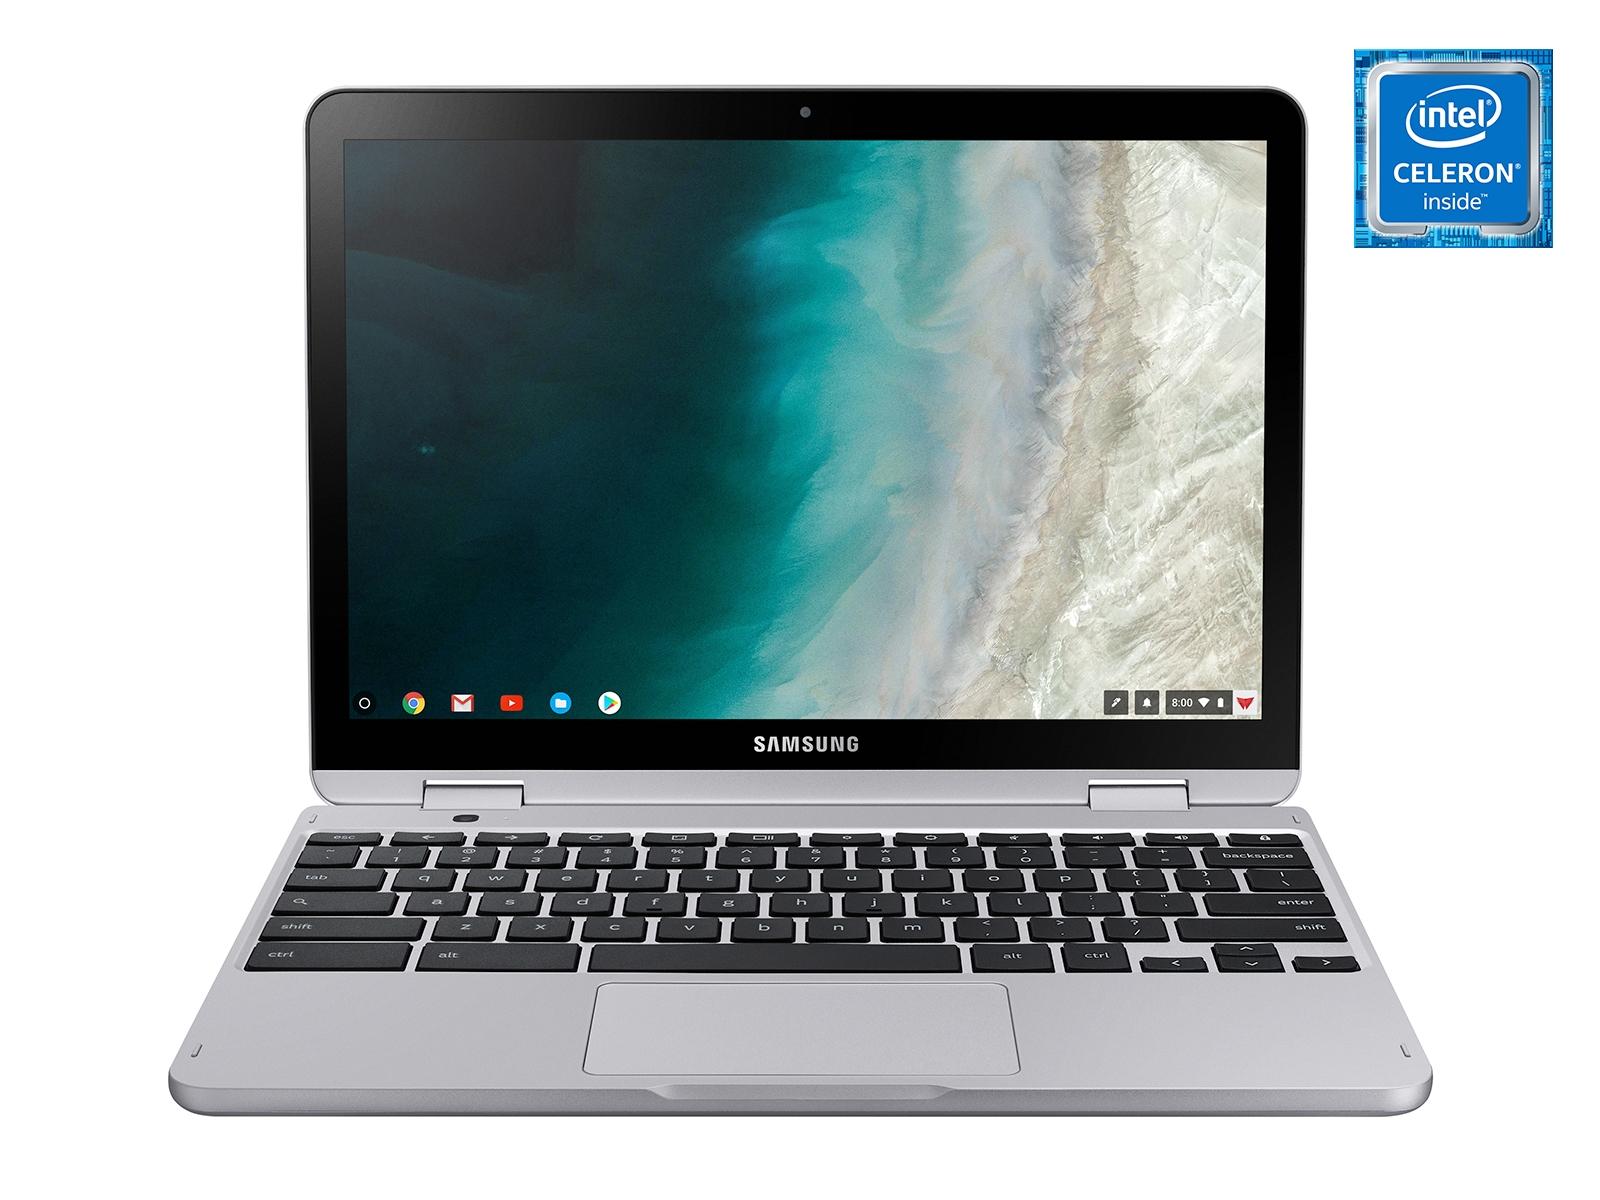 Samsung Chromebook Plus Chromebooks - XE520QAB-K02US | Samsung US